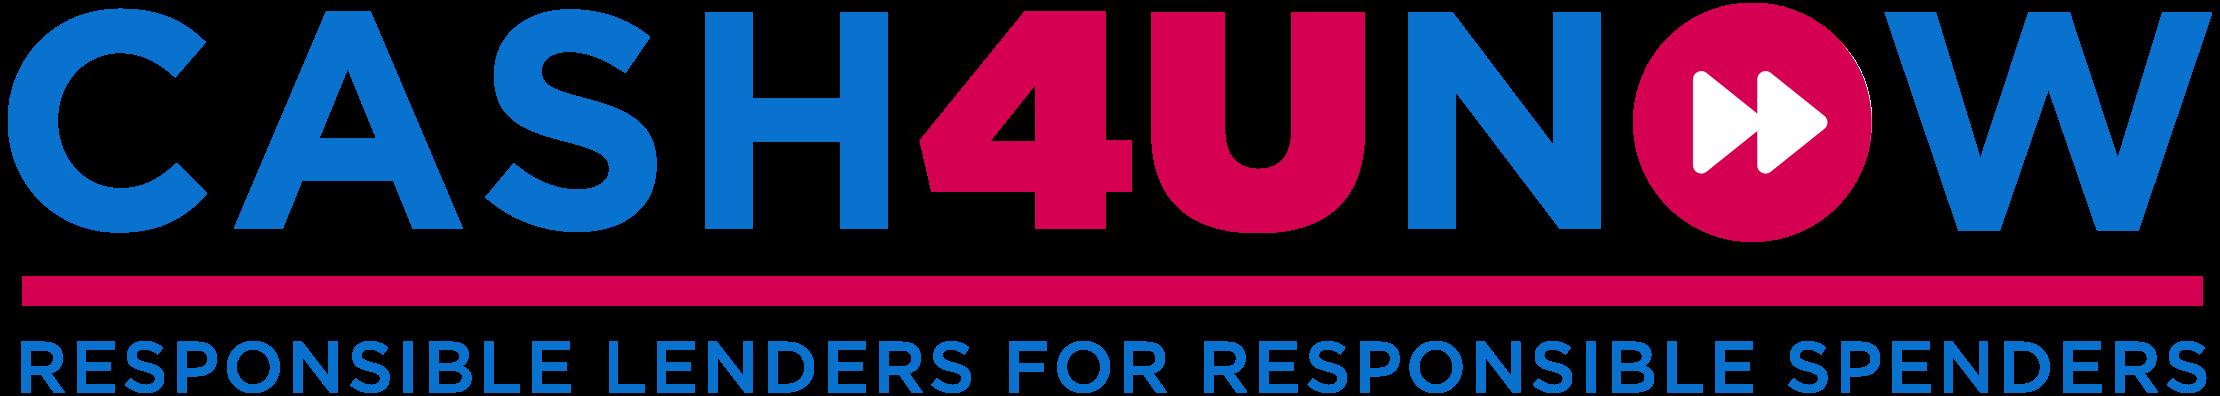 Cash4unow logo